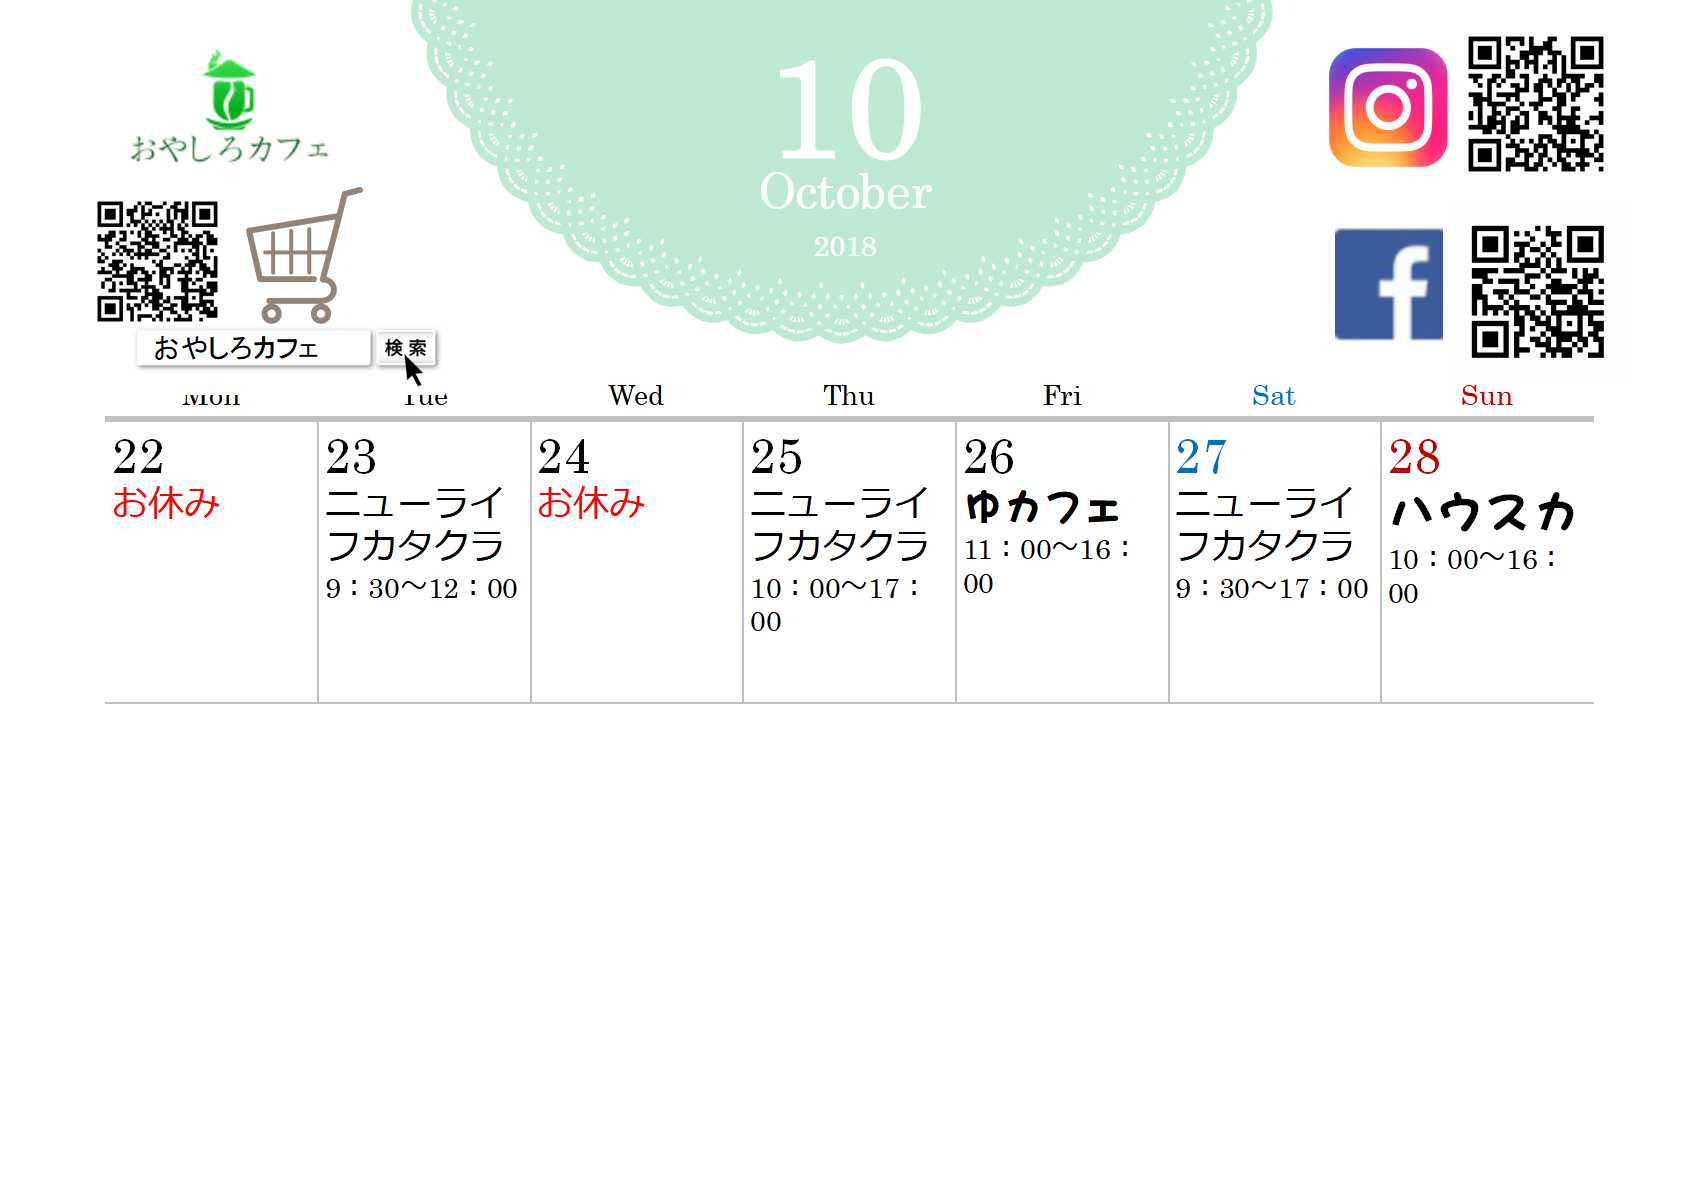 10月今週の出店情報